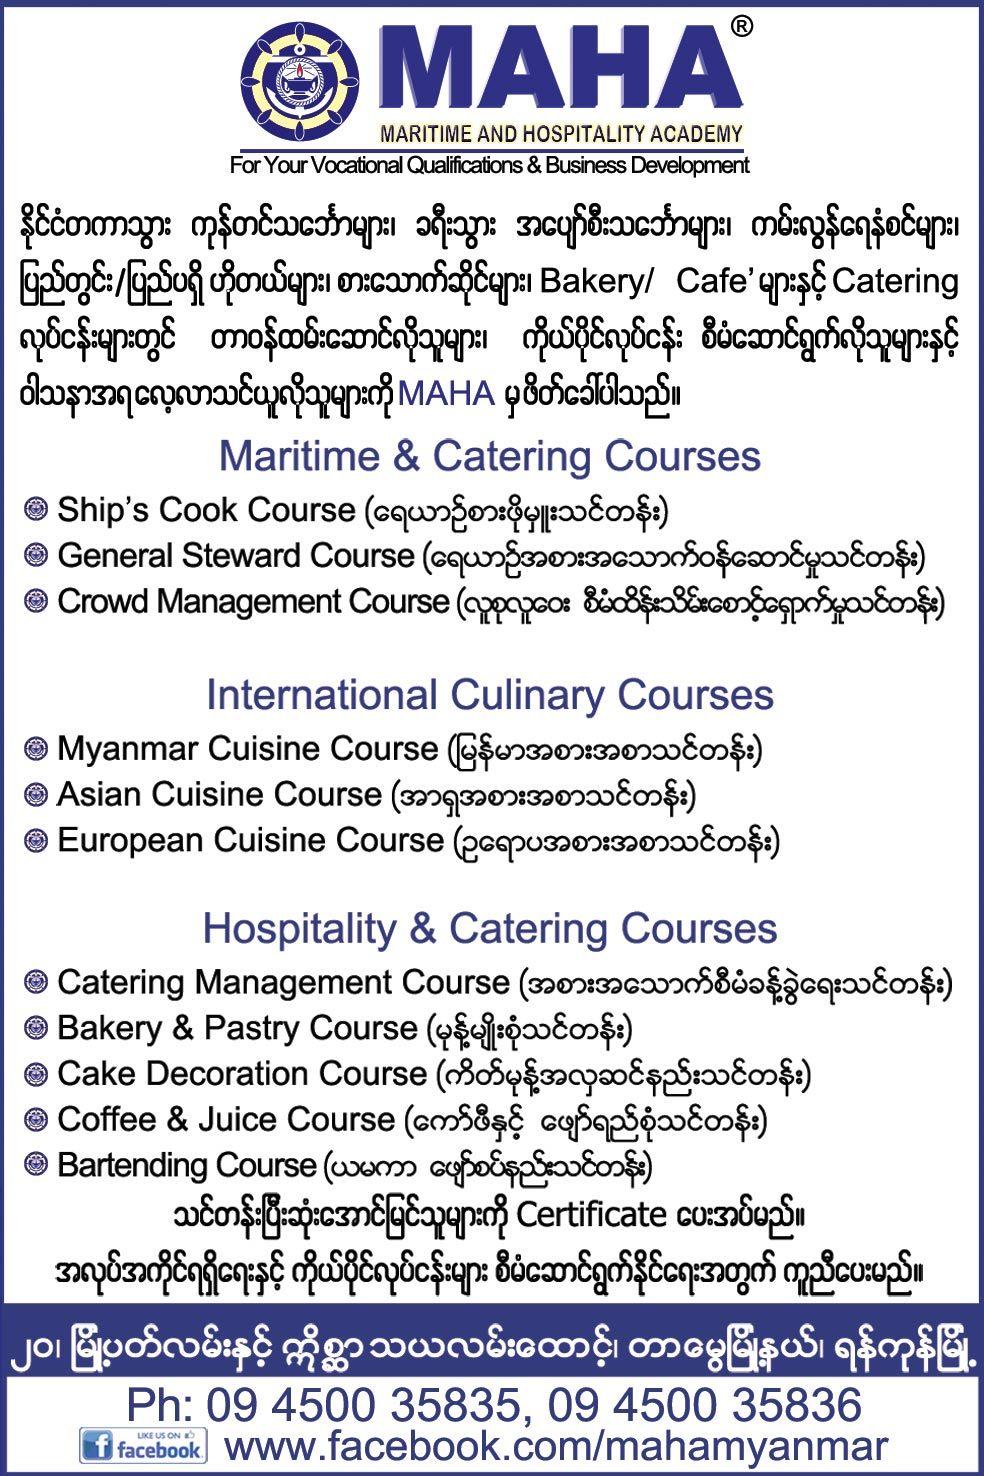 MAHA-Maritime-and-Hospitality-Academy_Hospitality-Training-Centres_(A)_1943.jpg